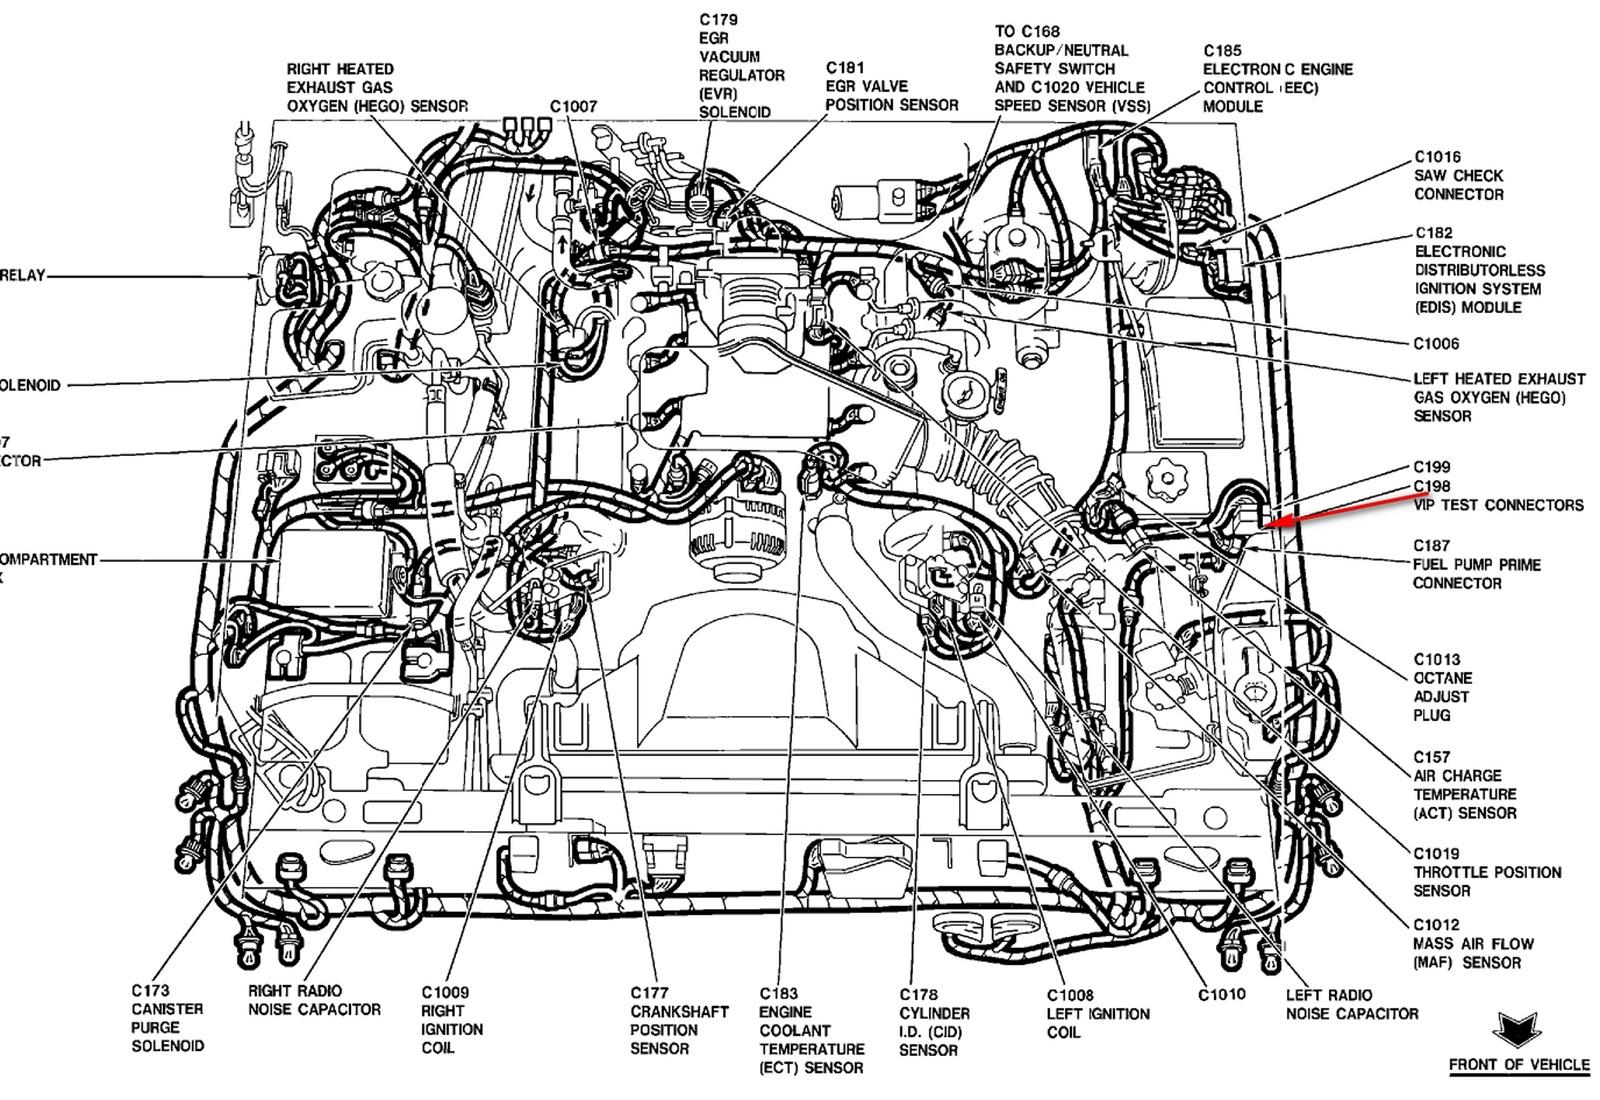 YY_4332] 1998 Mercury Mystique Engine Diagram Free Diagram